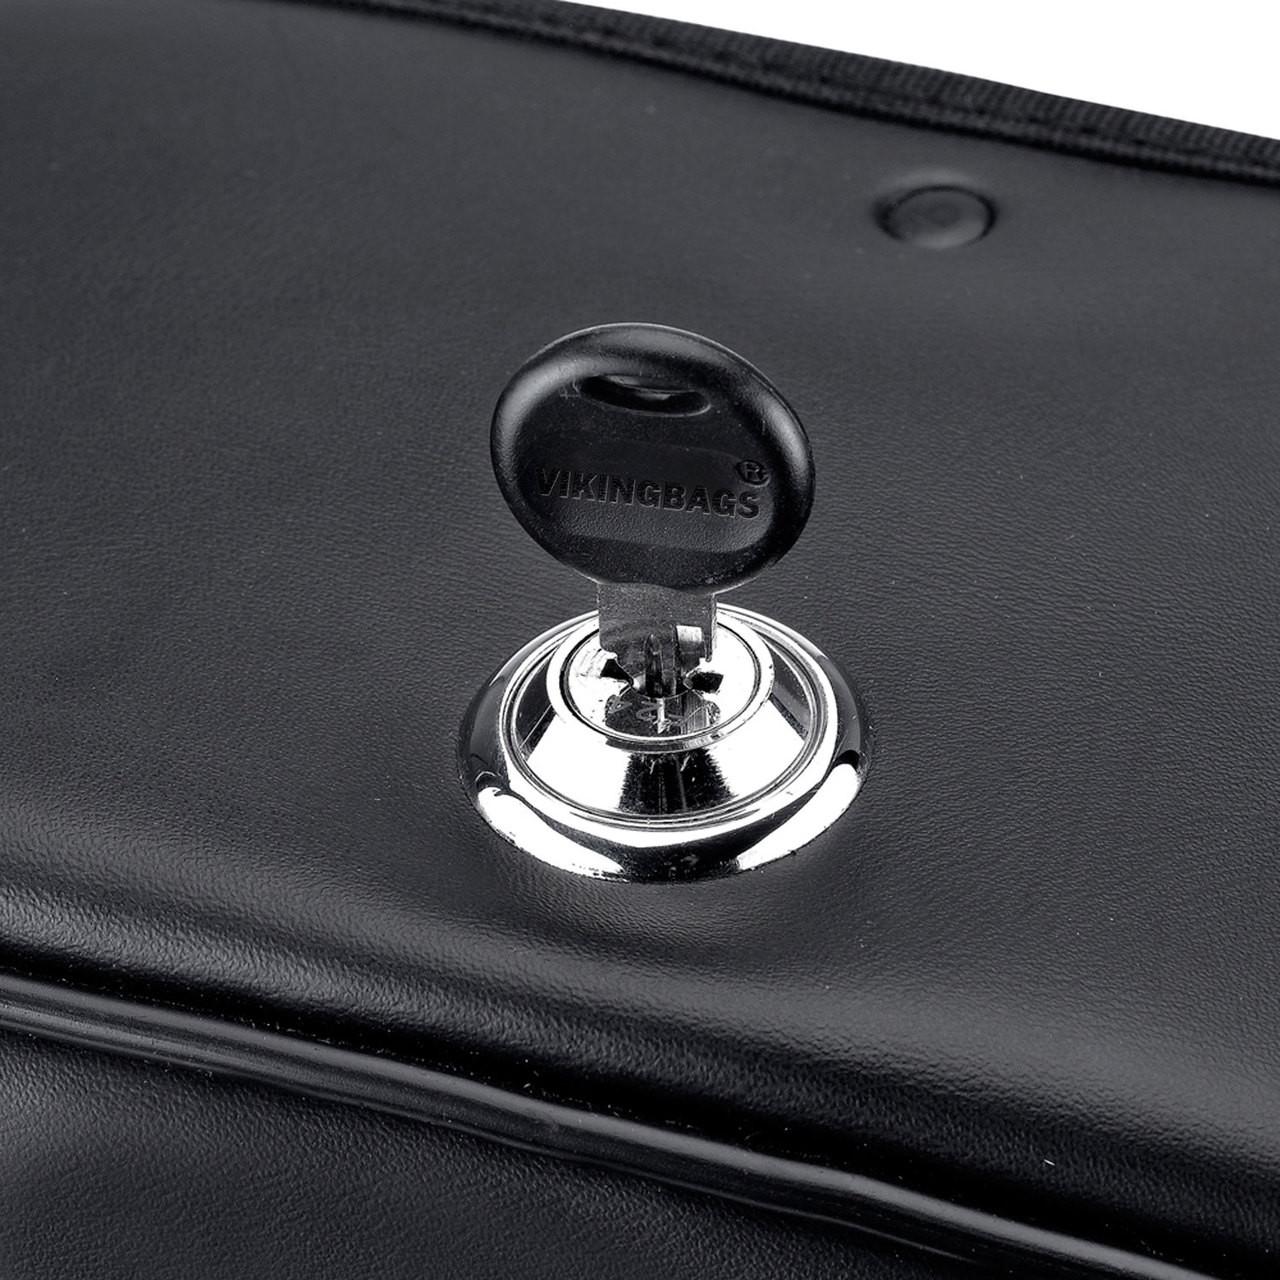 Charger Slanted Saddlebags key lock view